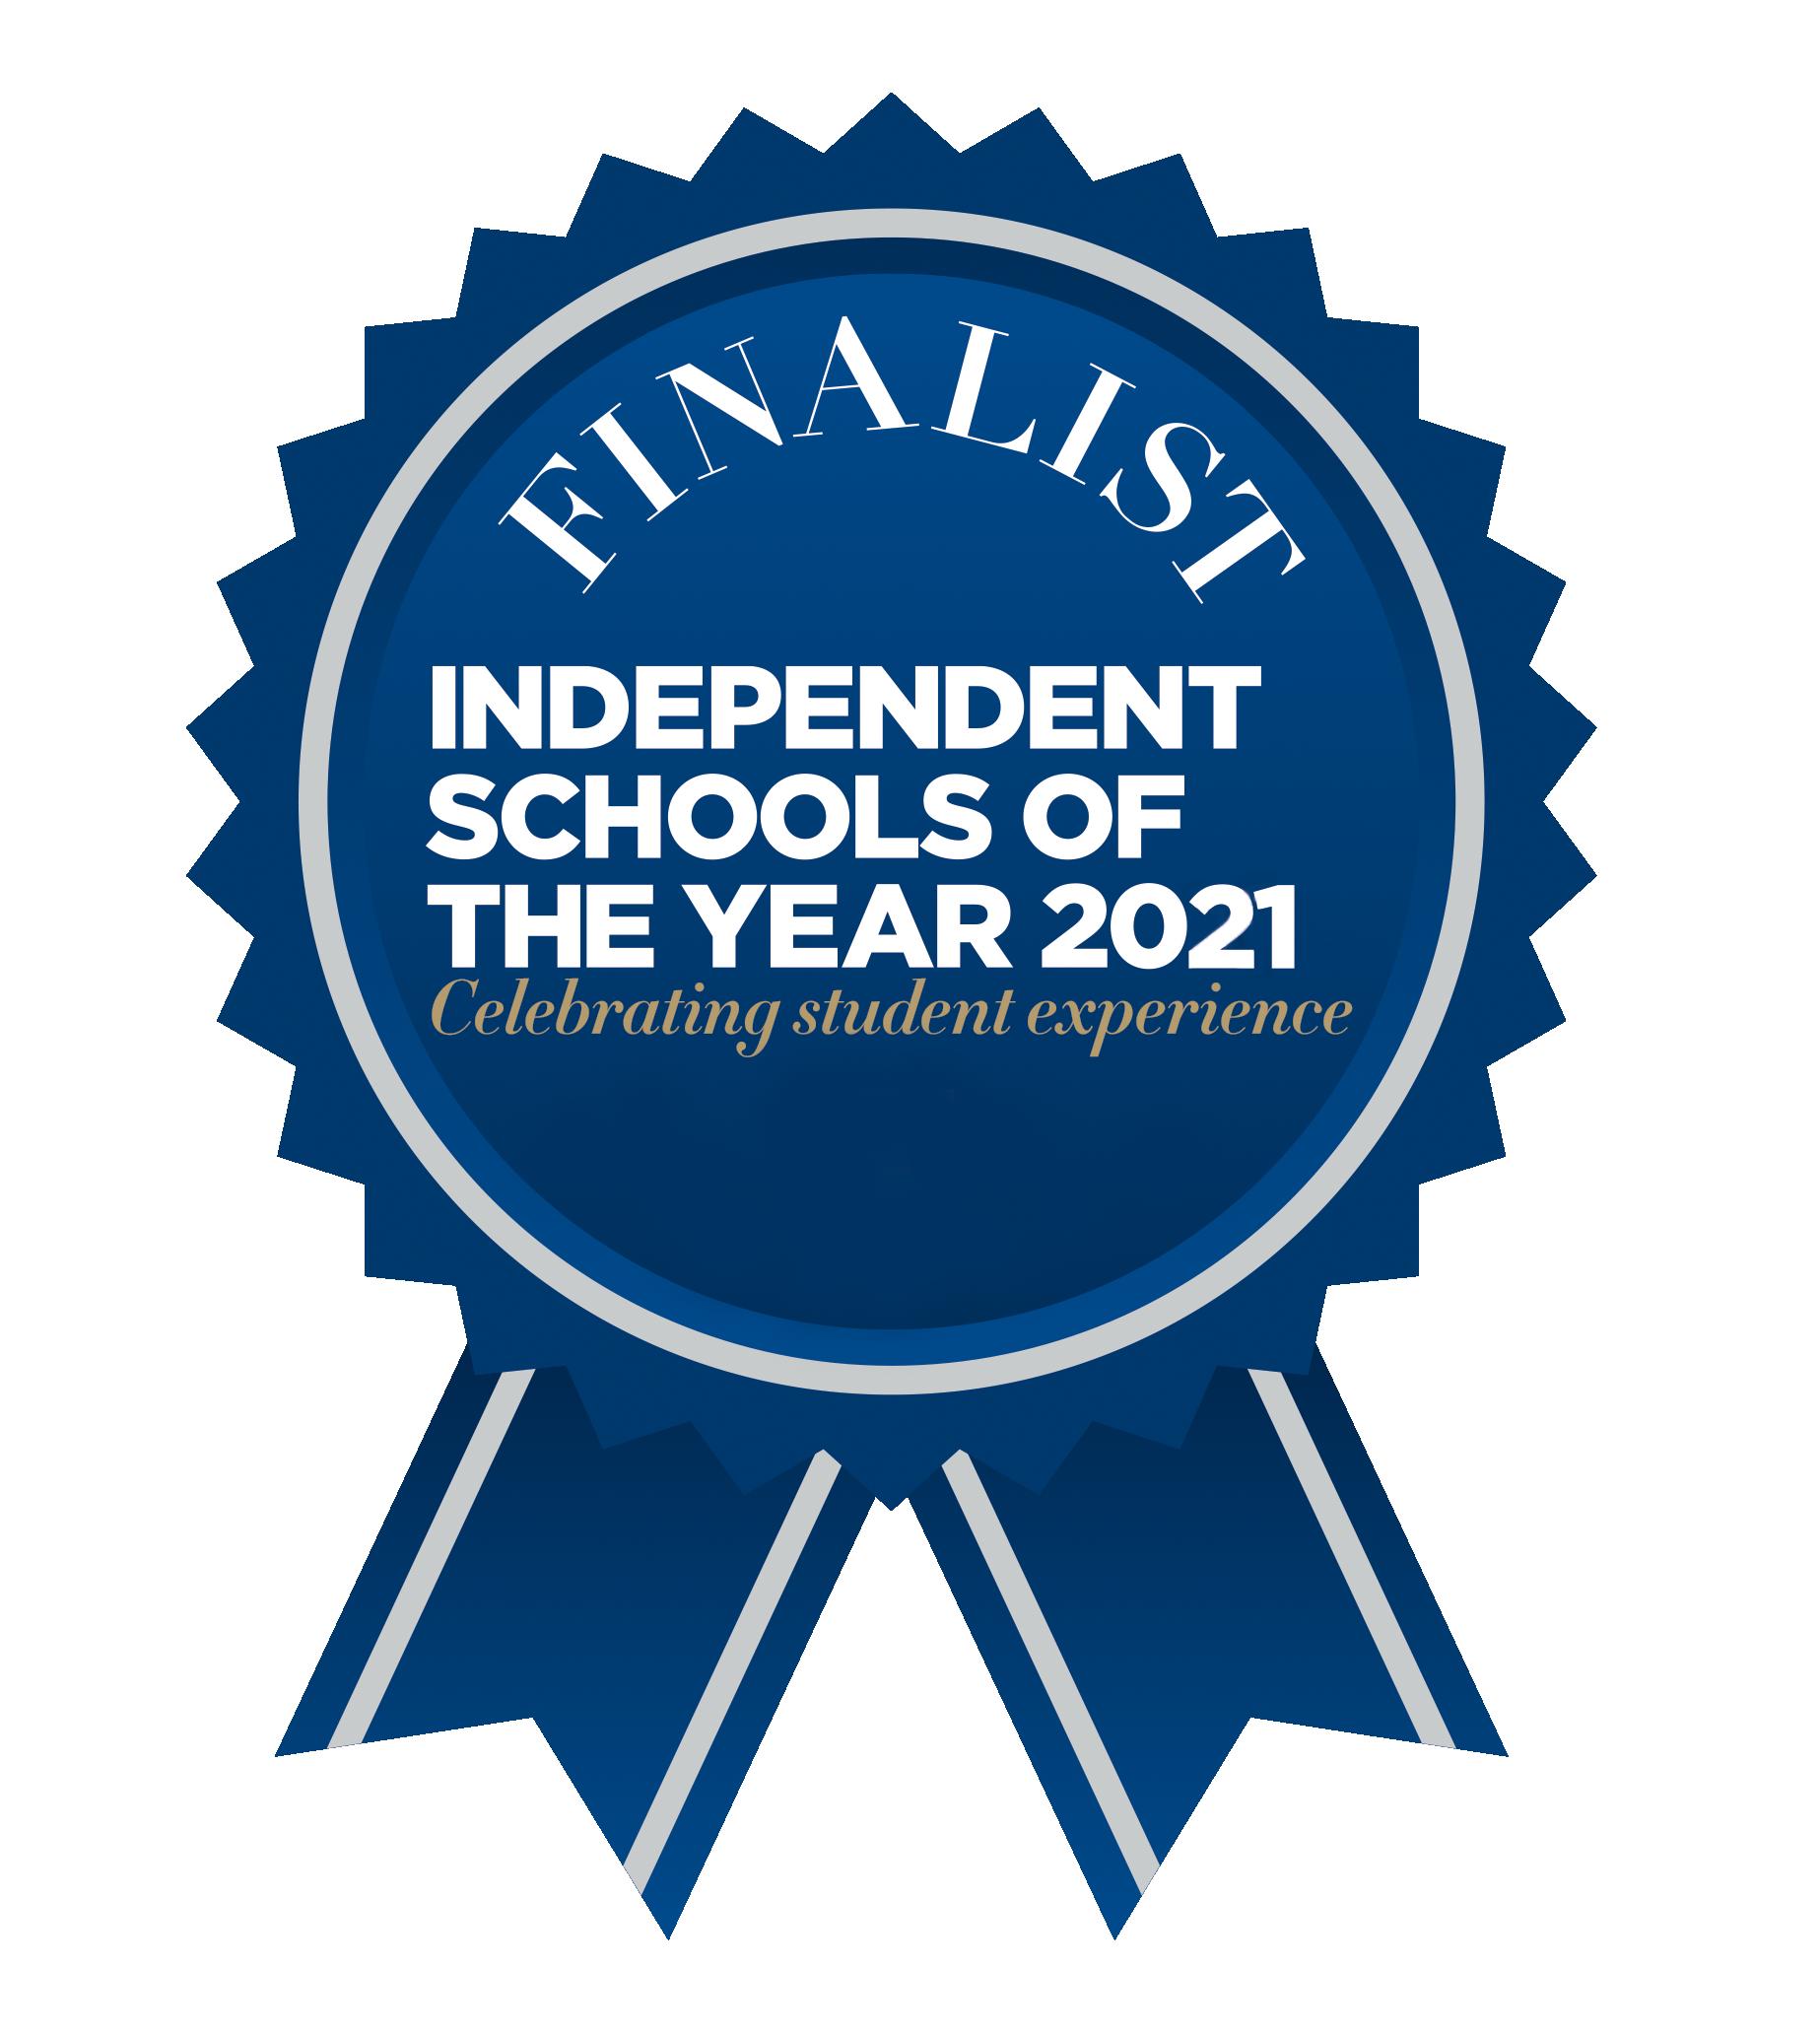 Independent Schools of the 2021